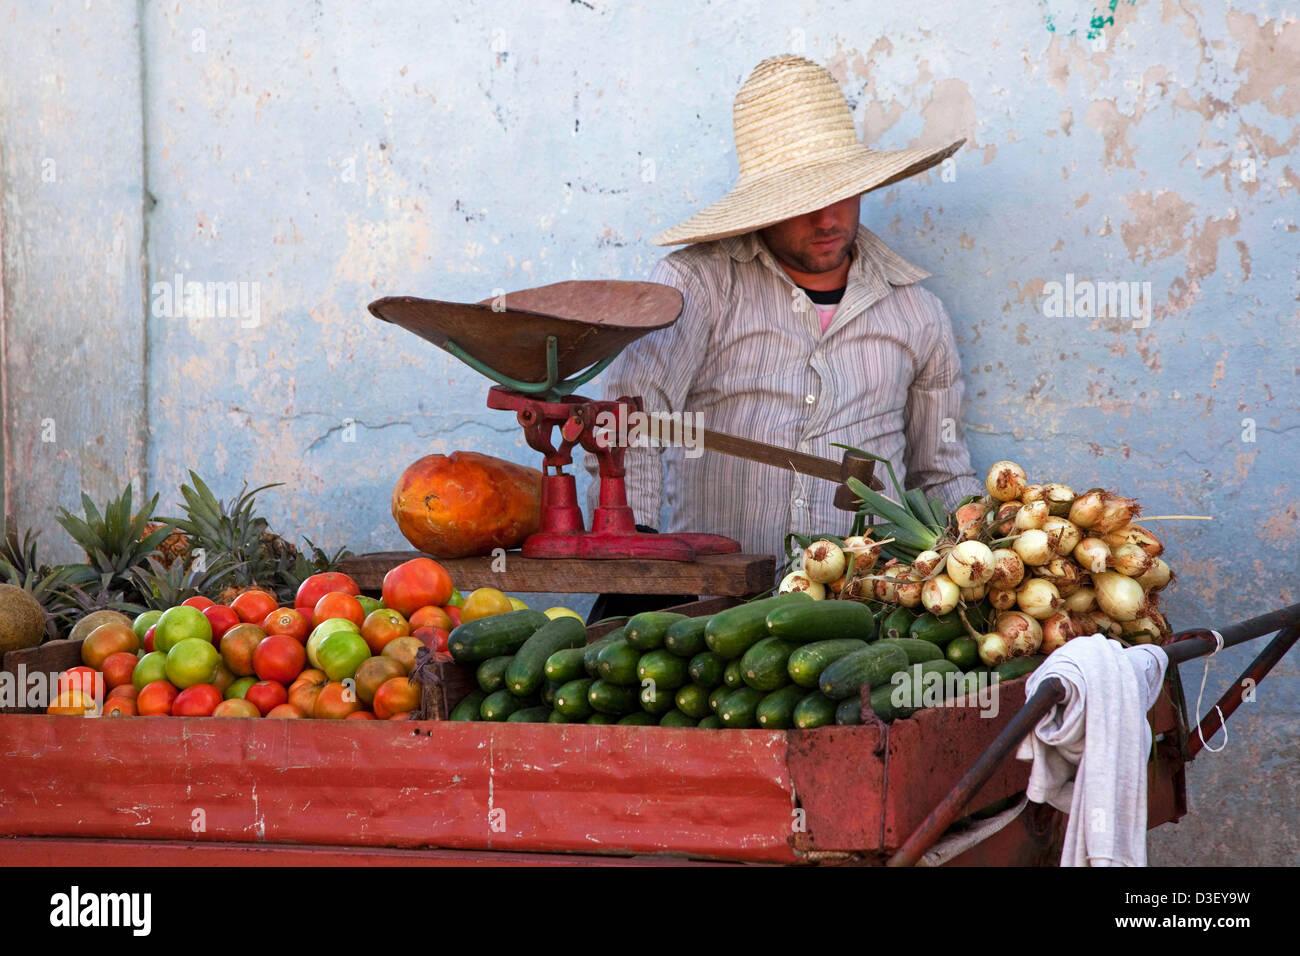 Cuban vendor selling fresh fruit and vegetables at market stall in Viñales, Cuba, Caribbean - Stock Image